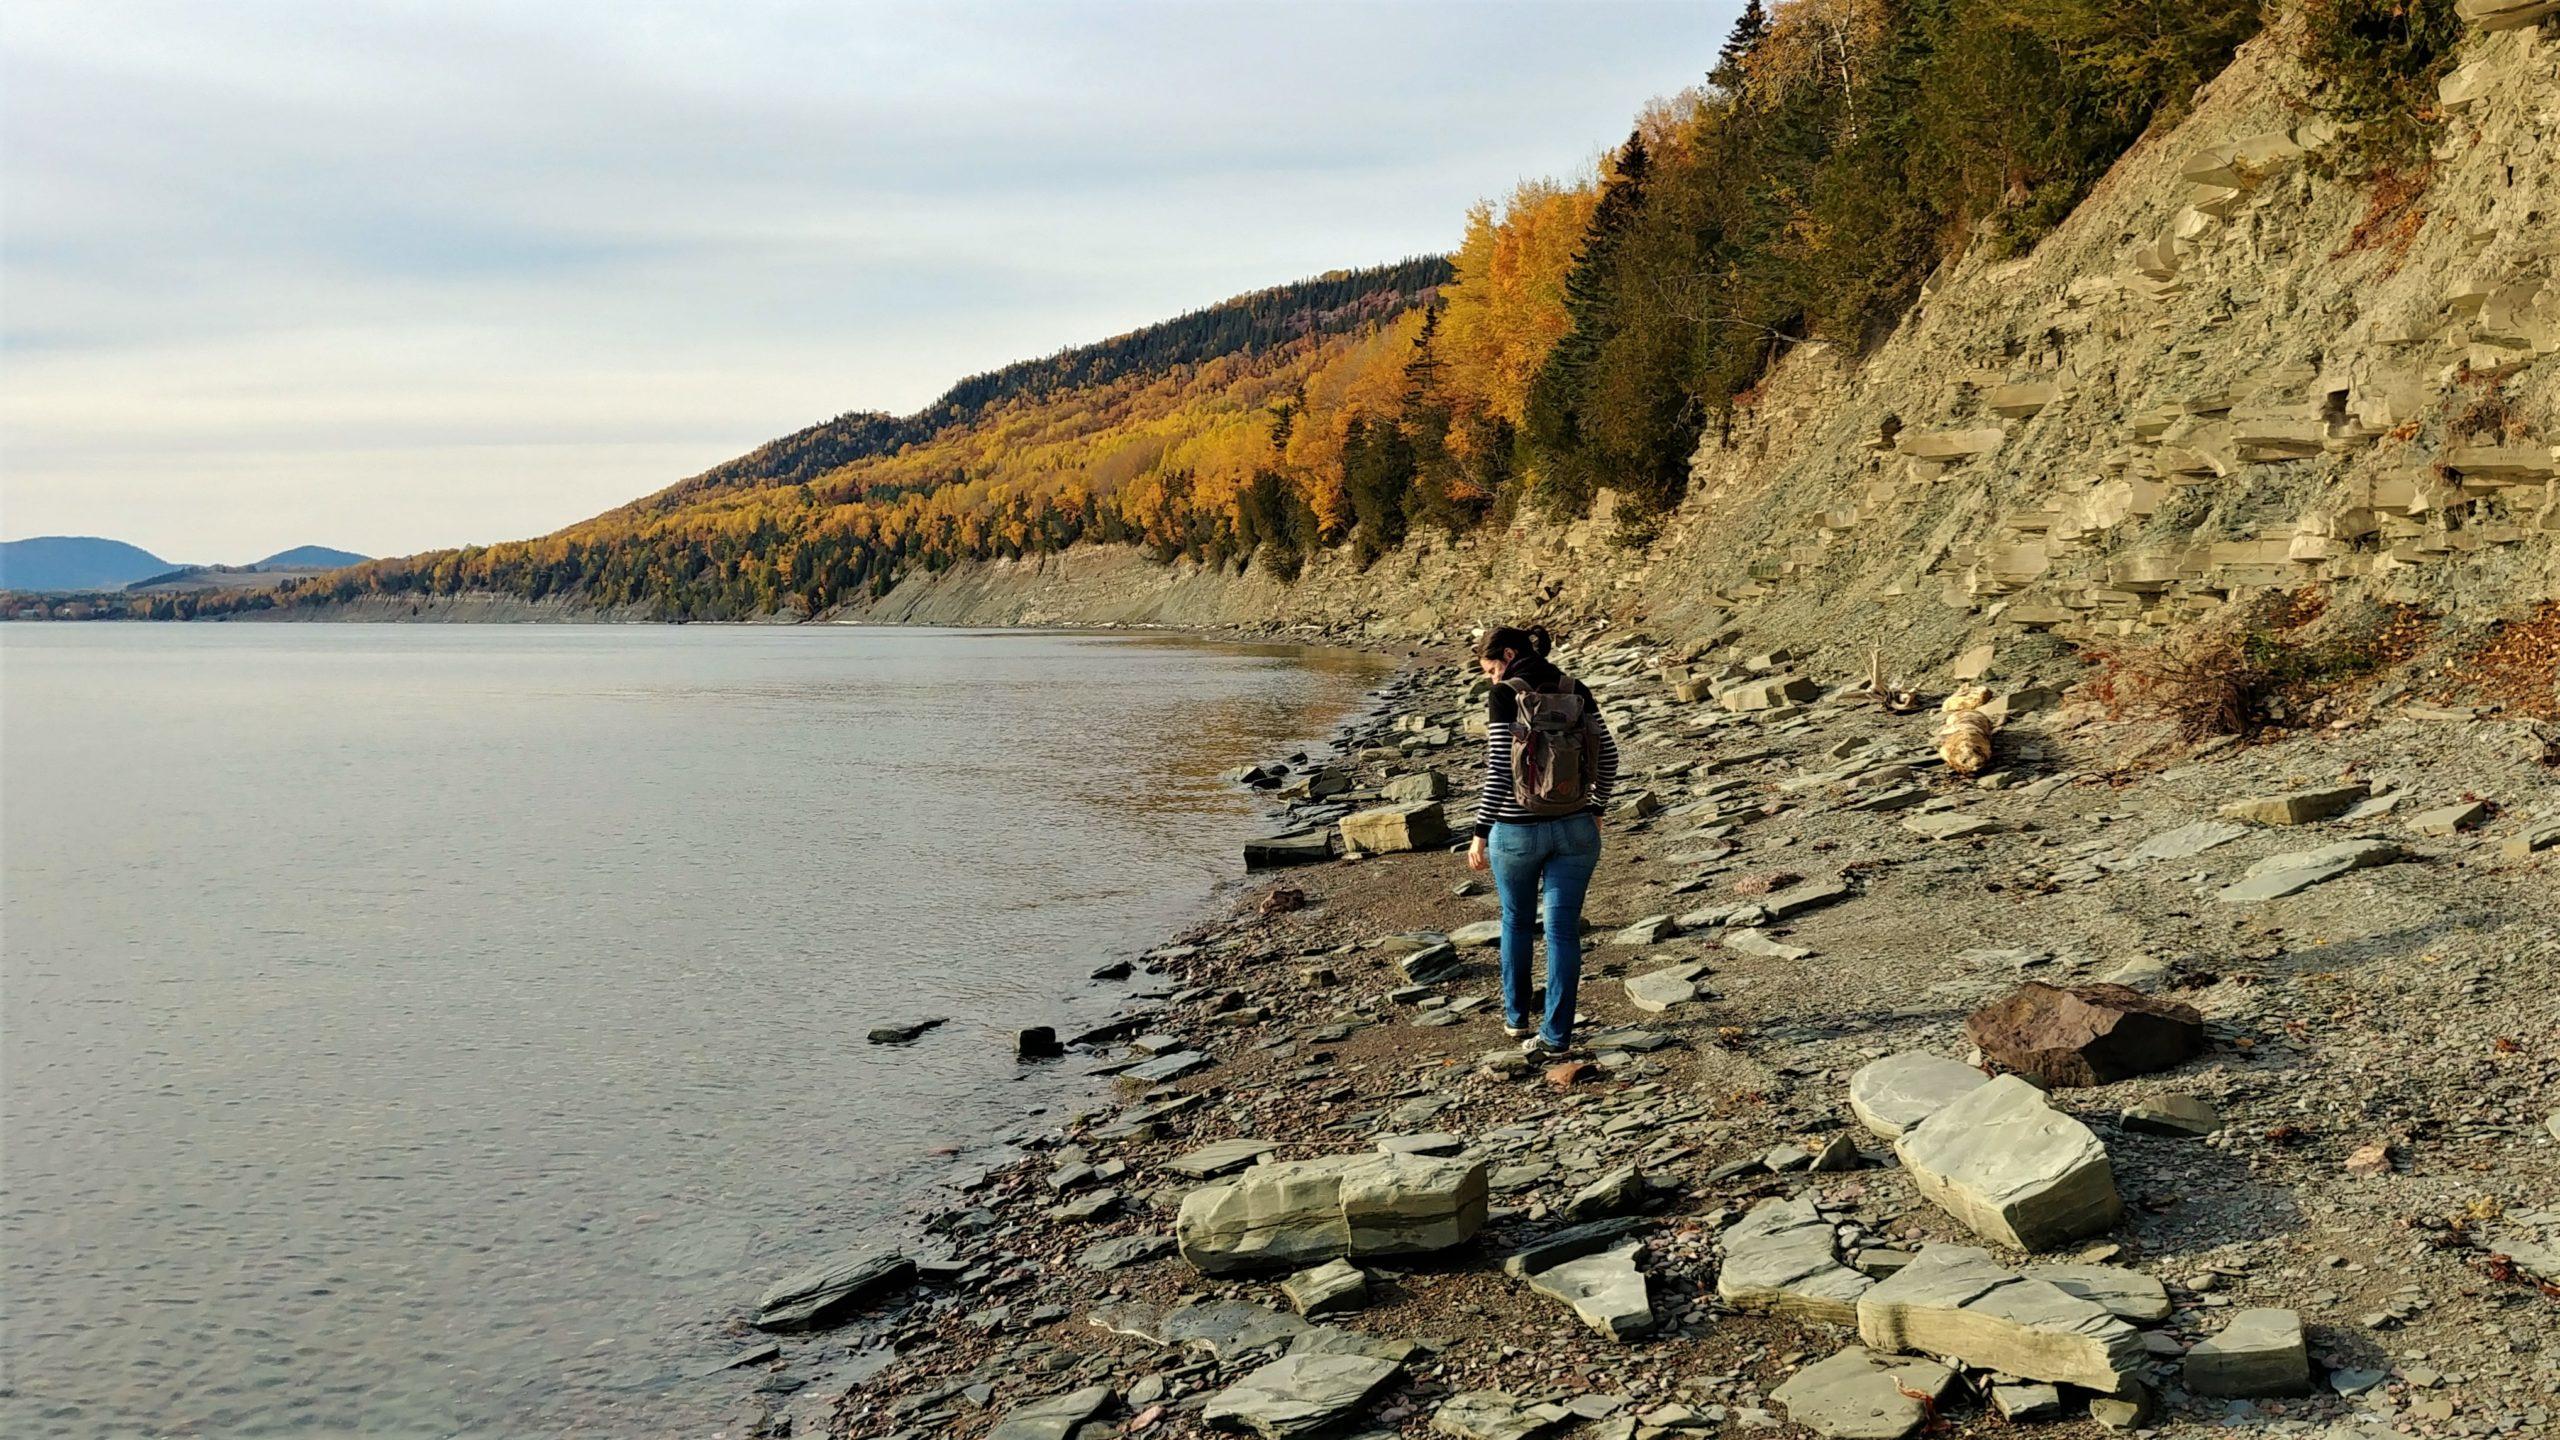 Parc national Miguasha Québec visiter infos pratiques blog voyage canada arpenter le chemin